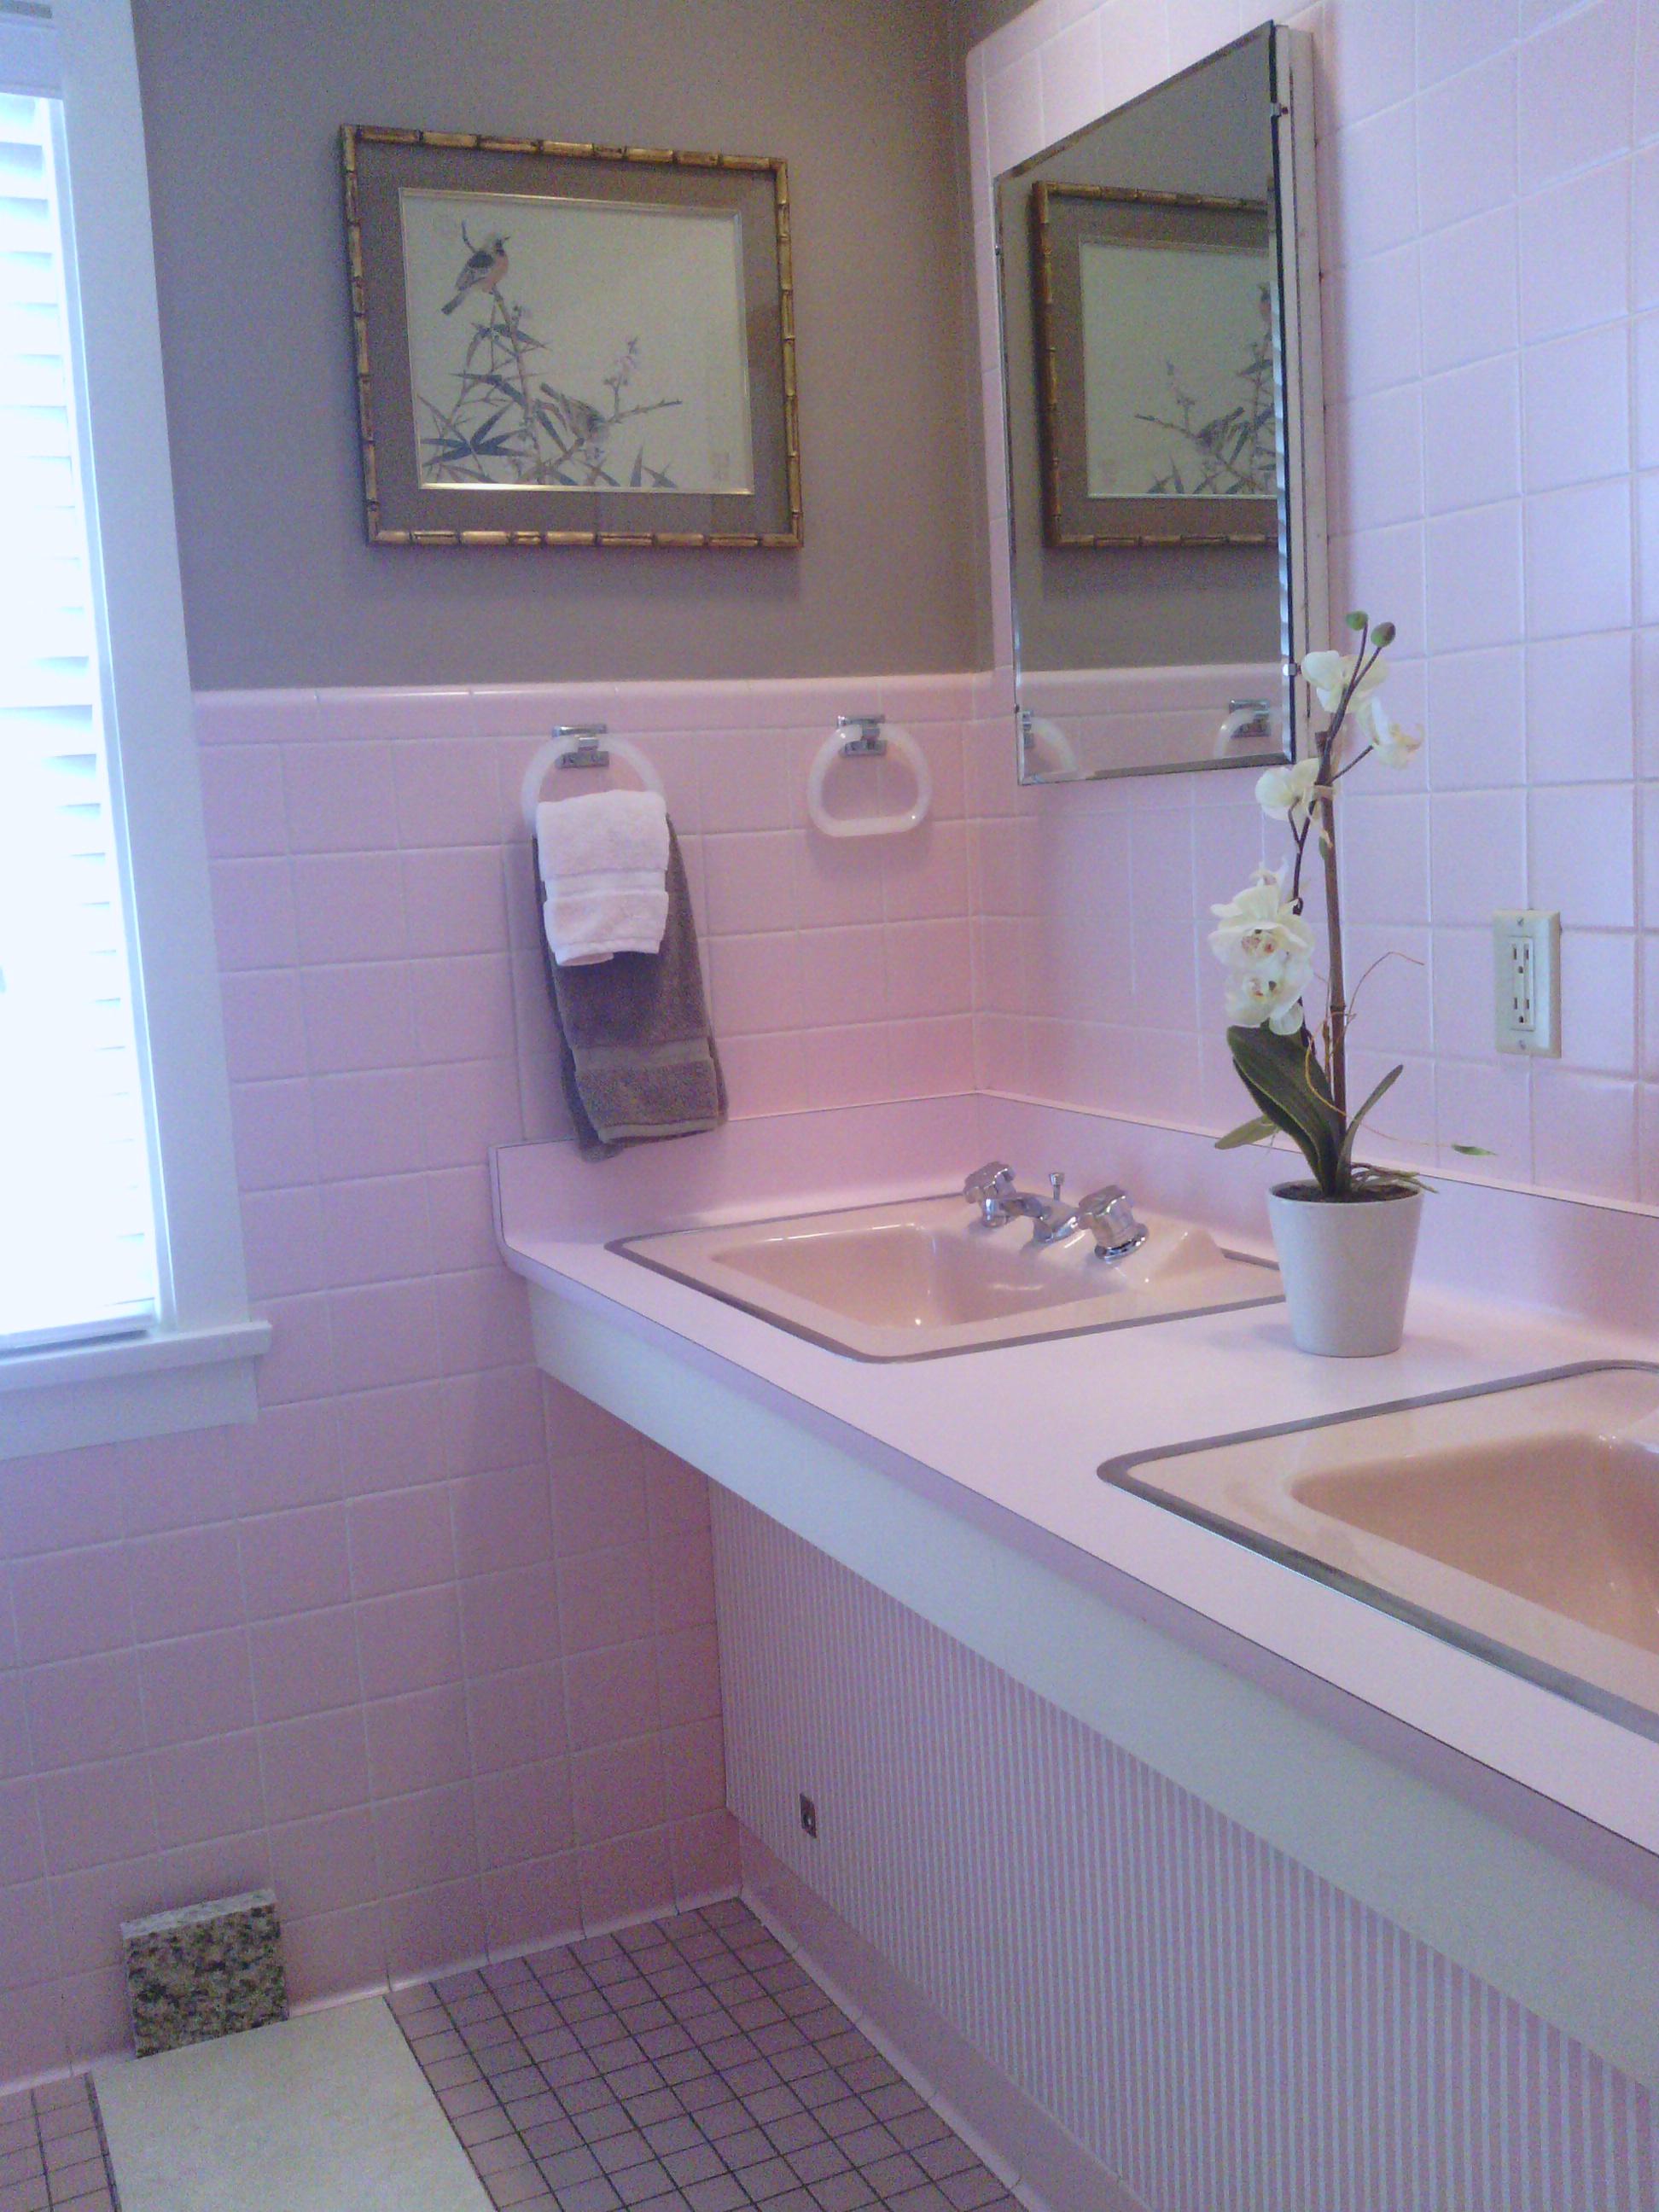 Img 20150605 125317 brewer contracting remodeling kitchen bath floor waterproofing - Bathroom remodel kenosha wi ...